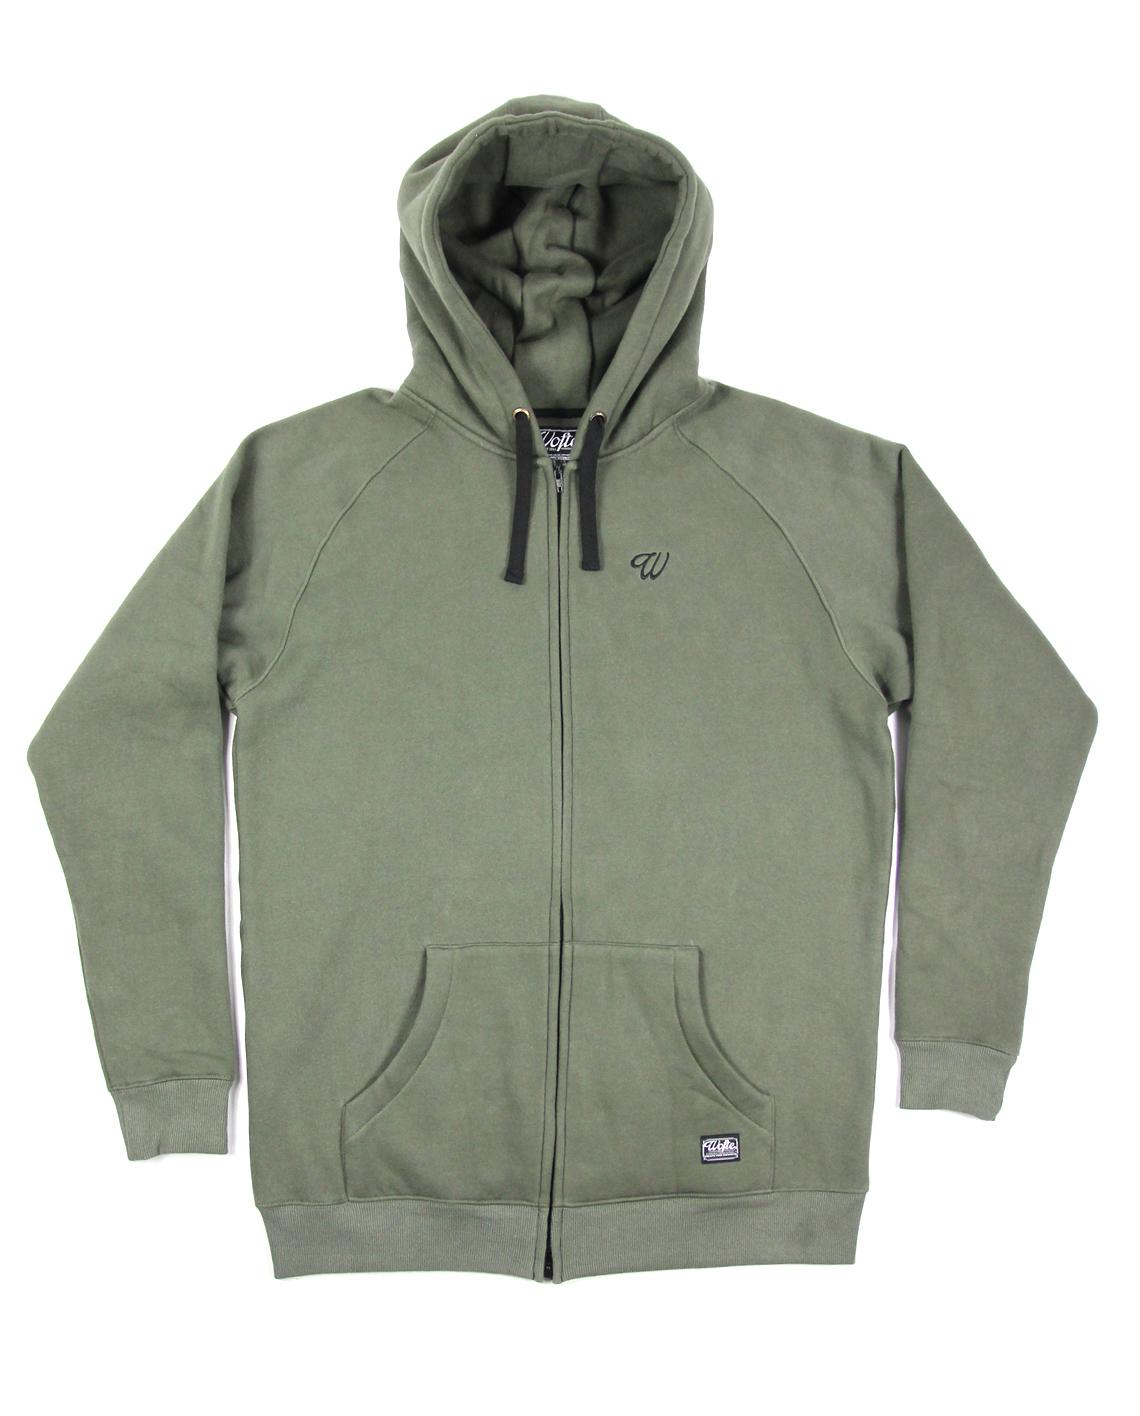 Wofte Clothing Olive D-LO Zipped Hood